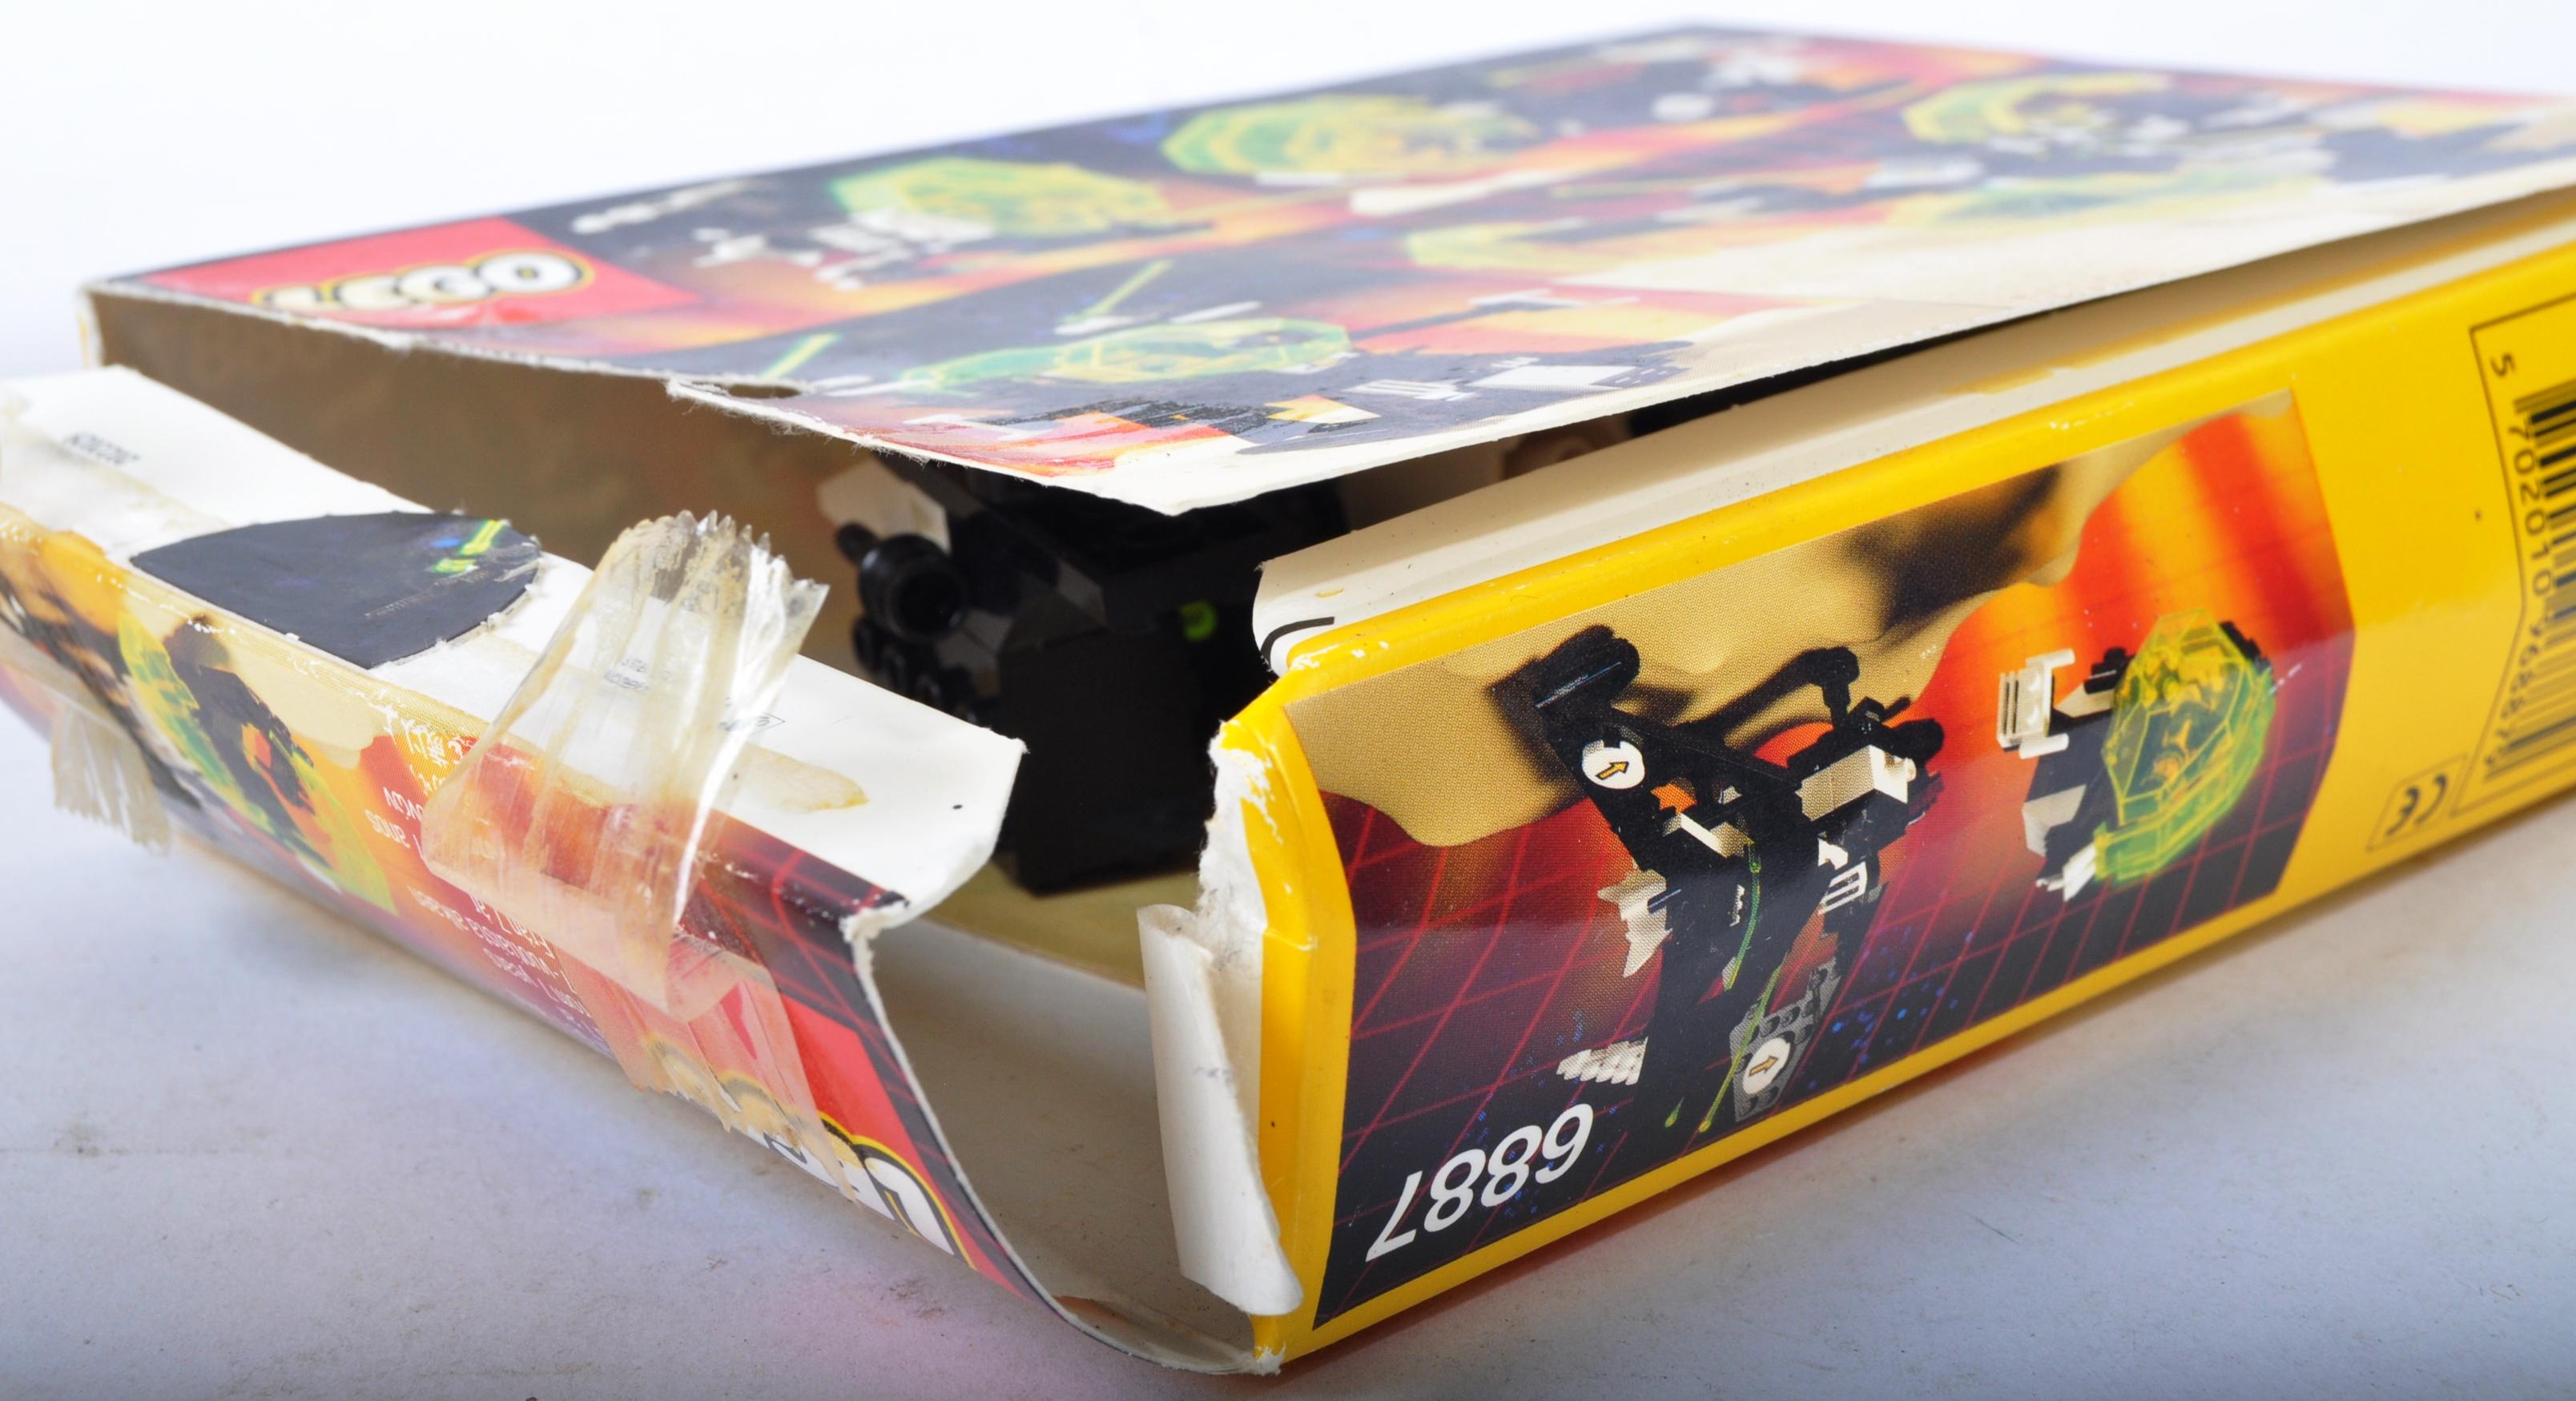 LEGO SETS - BLACKTRON - 6832 / 6833 / 6851 / 6878 / 6887 - Image 10 of 10